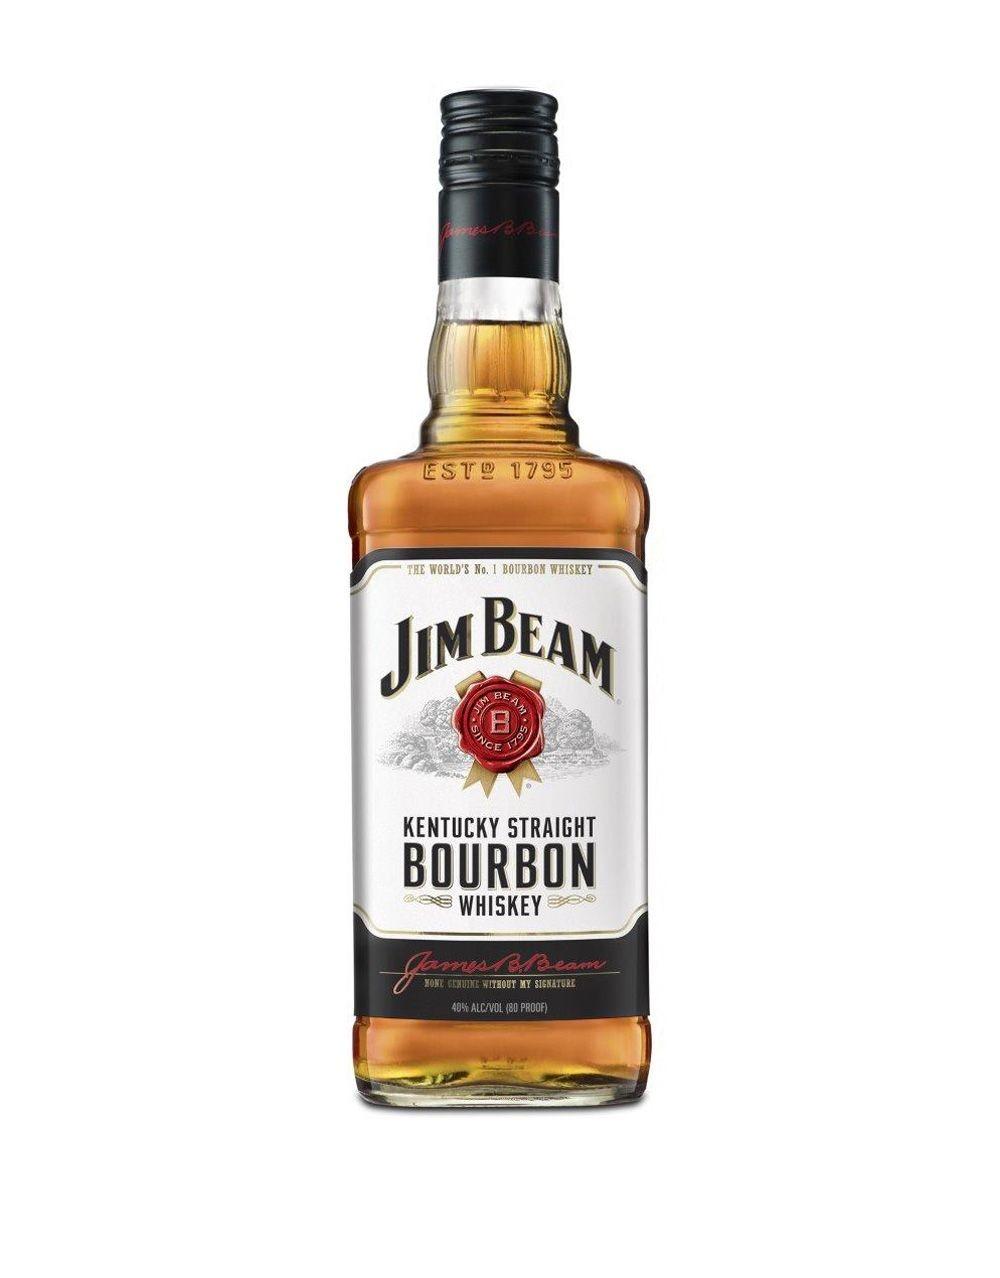 jim beam bourbon whiskey buy online or send as a gift reservebar